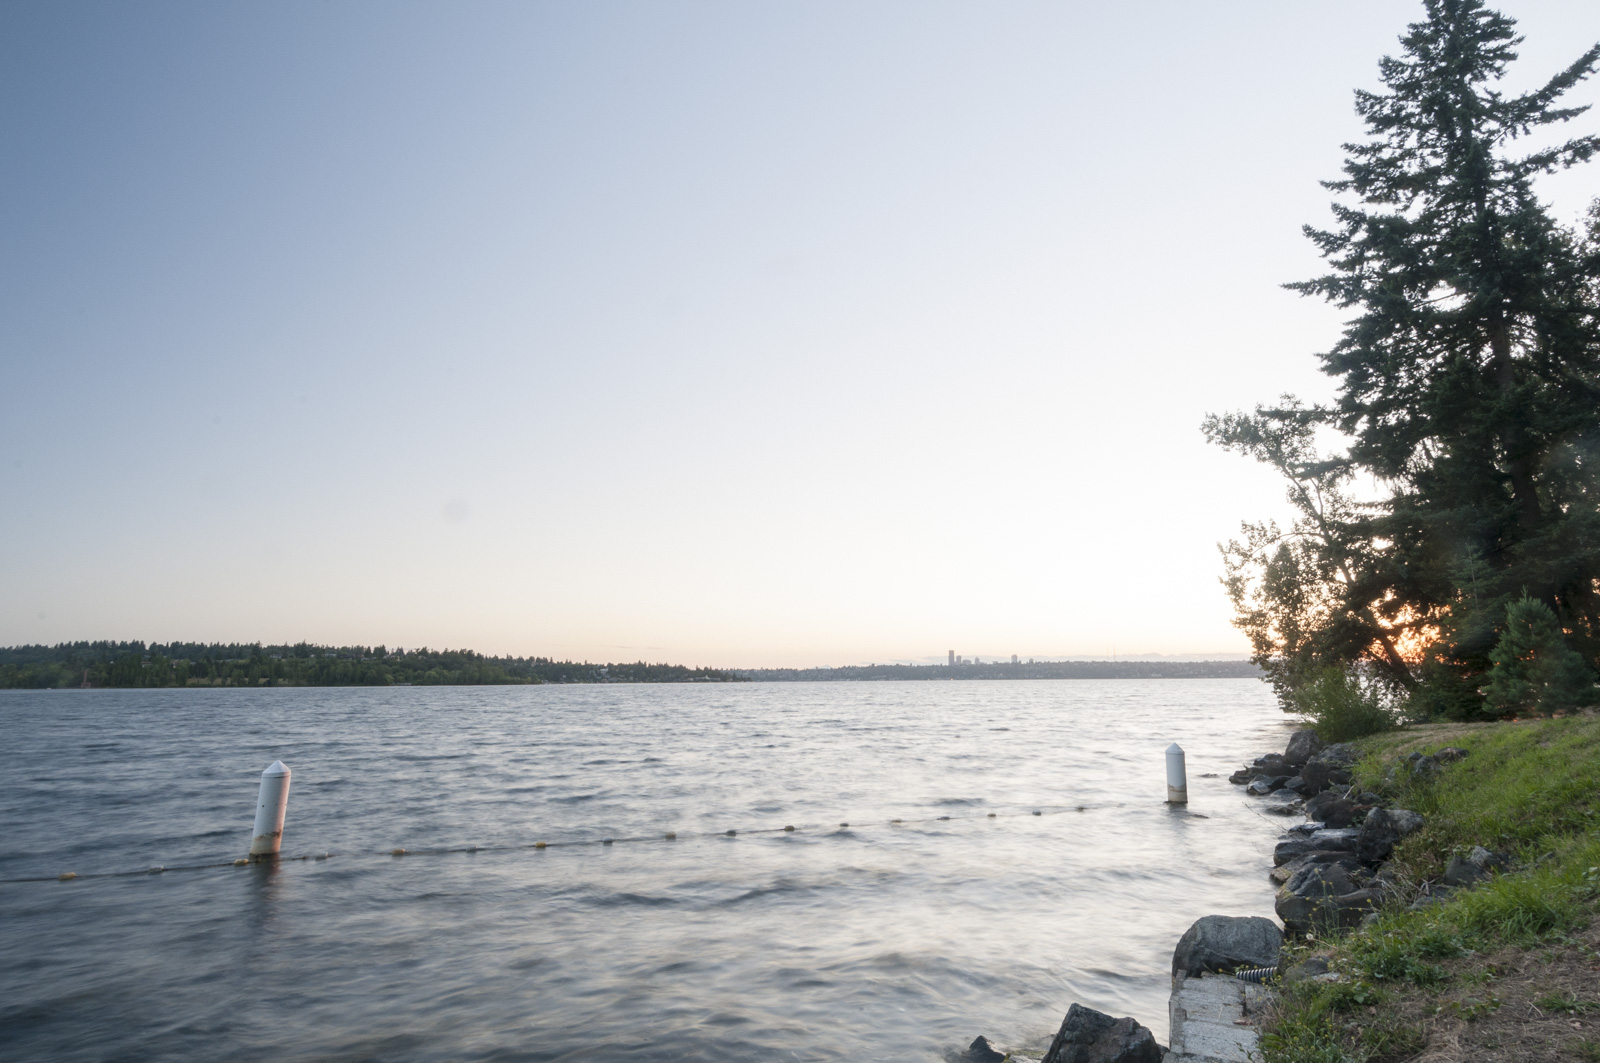 Lake Washington, Chism Park, Bellevue, Washington 2016